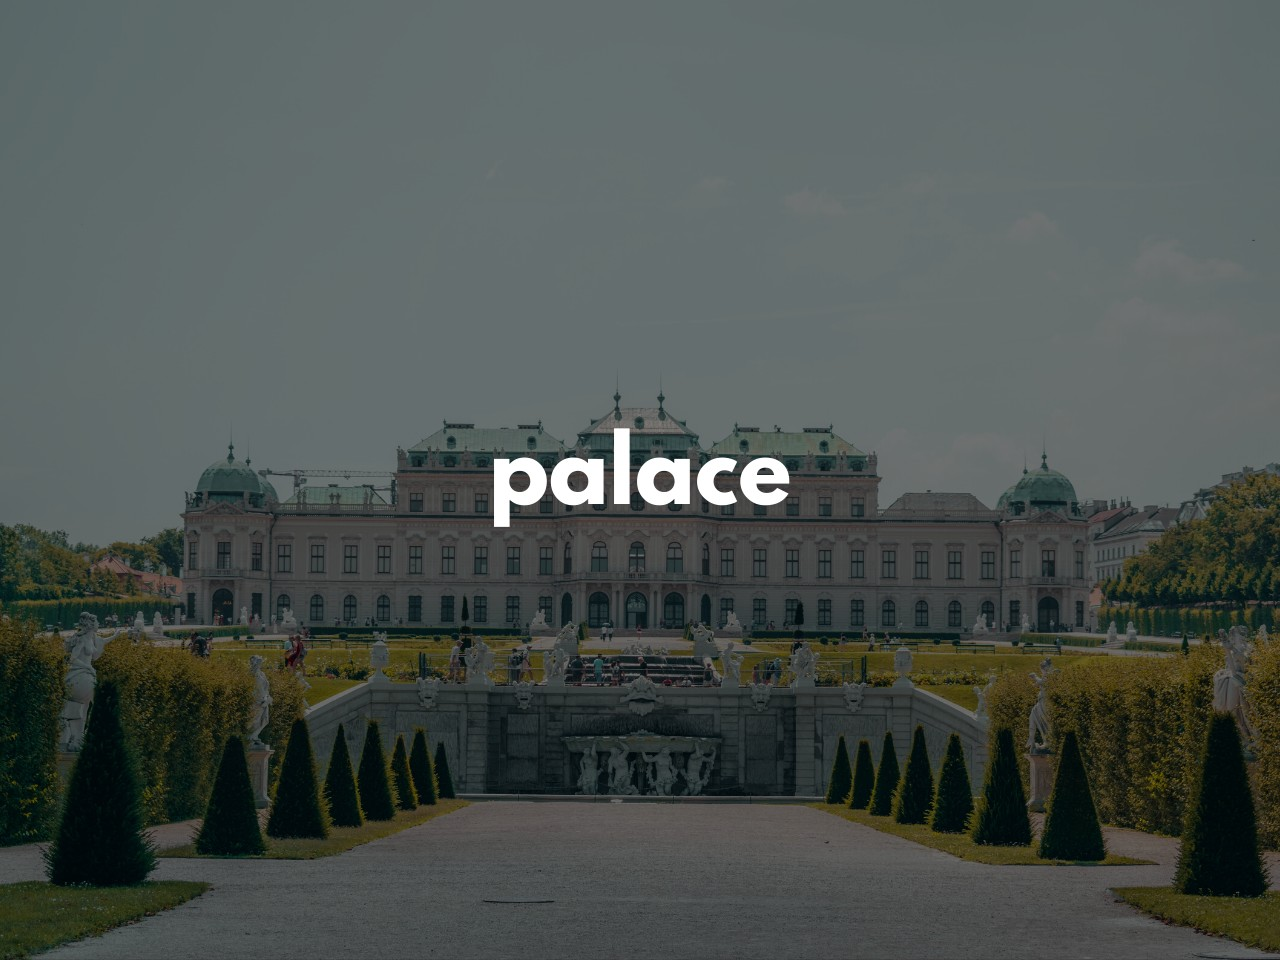 palace : 宮殿